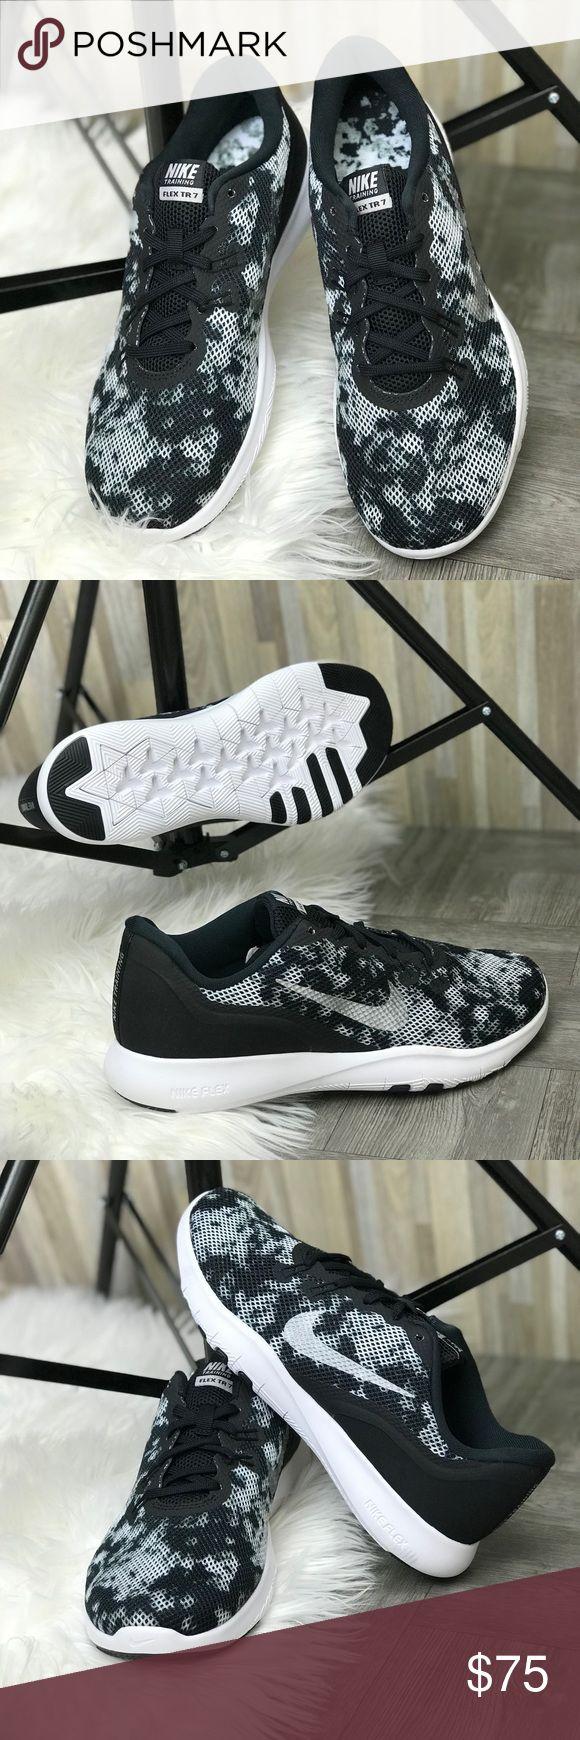 NWT Nike Flex Trainer 7 PRINT WMNS